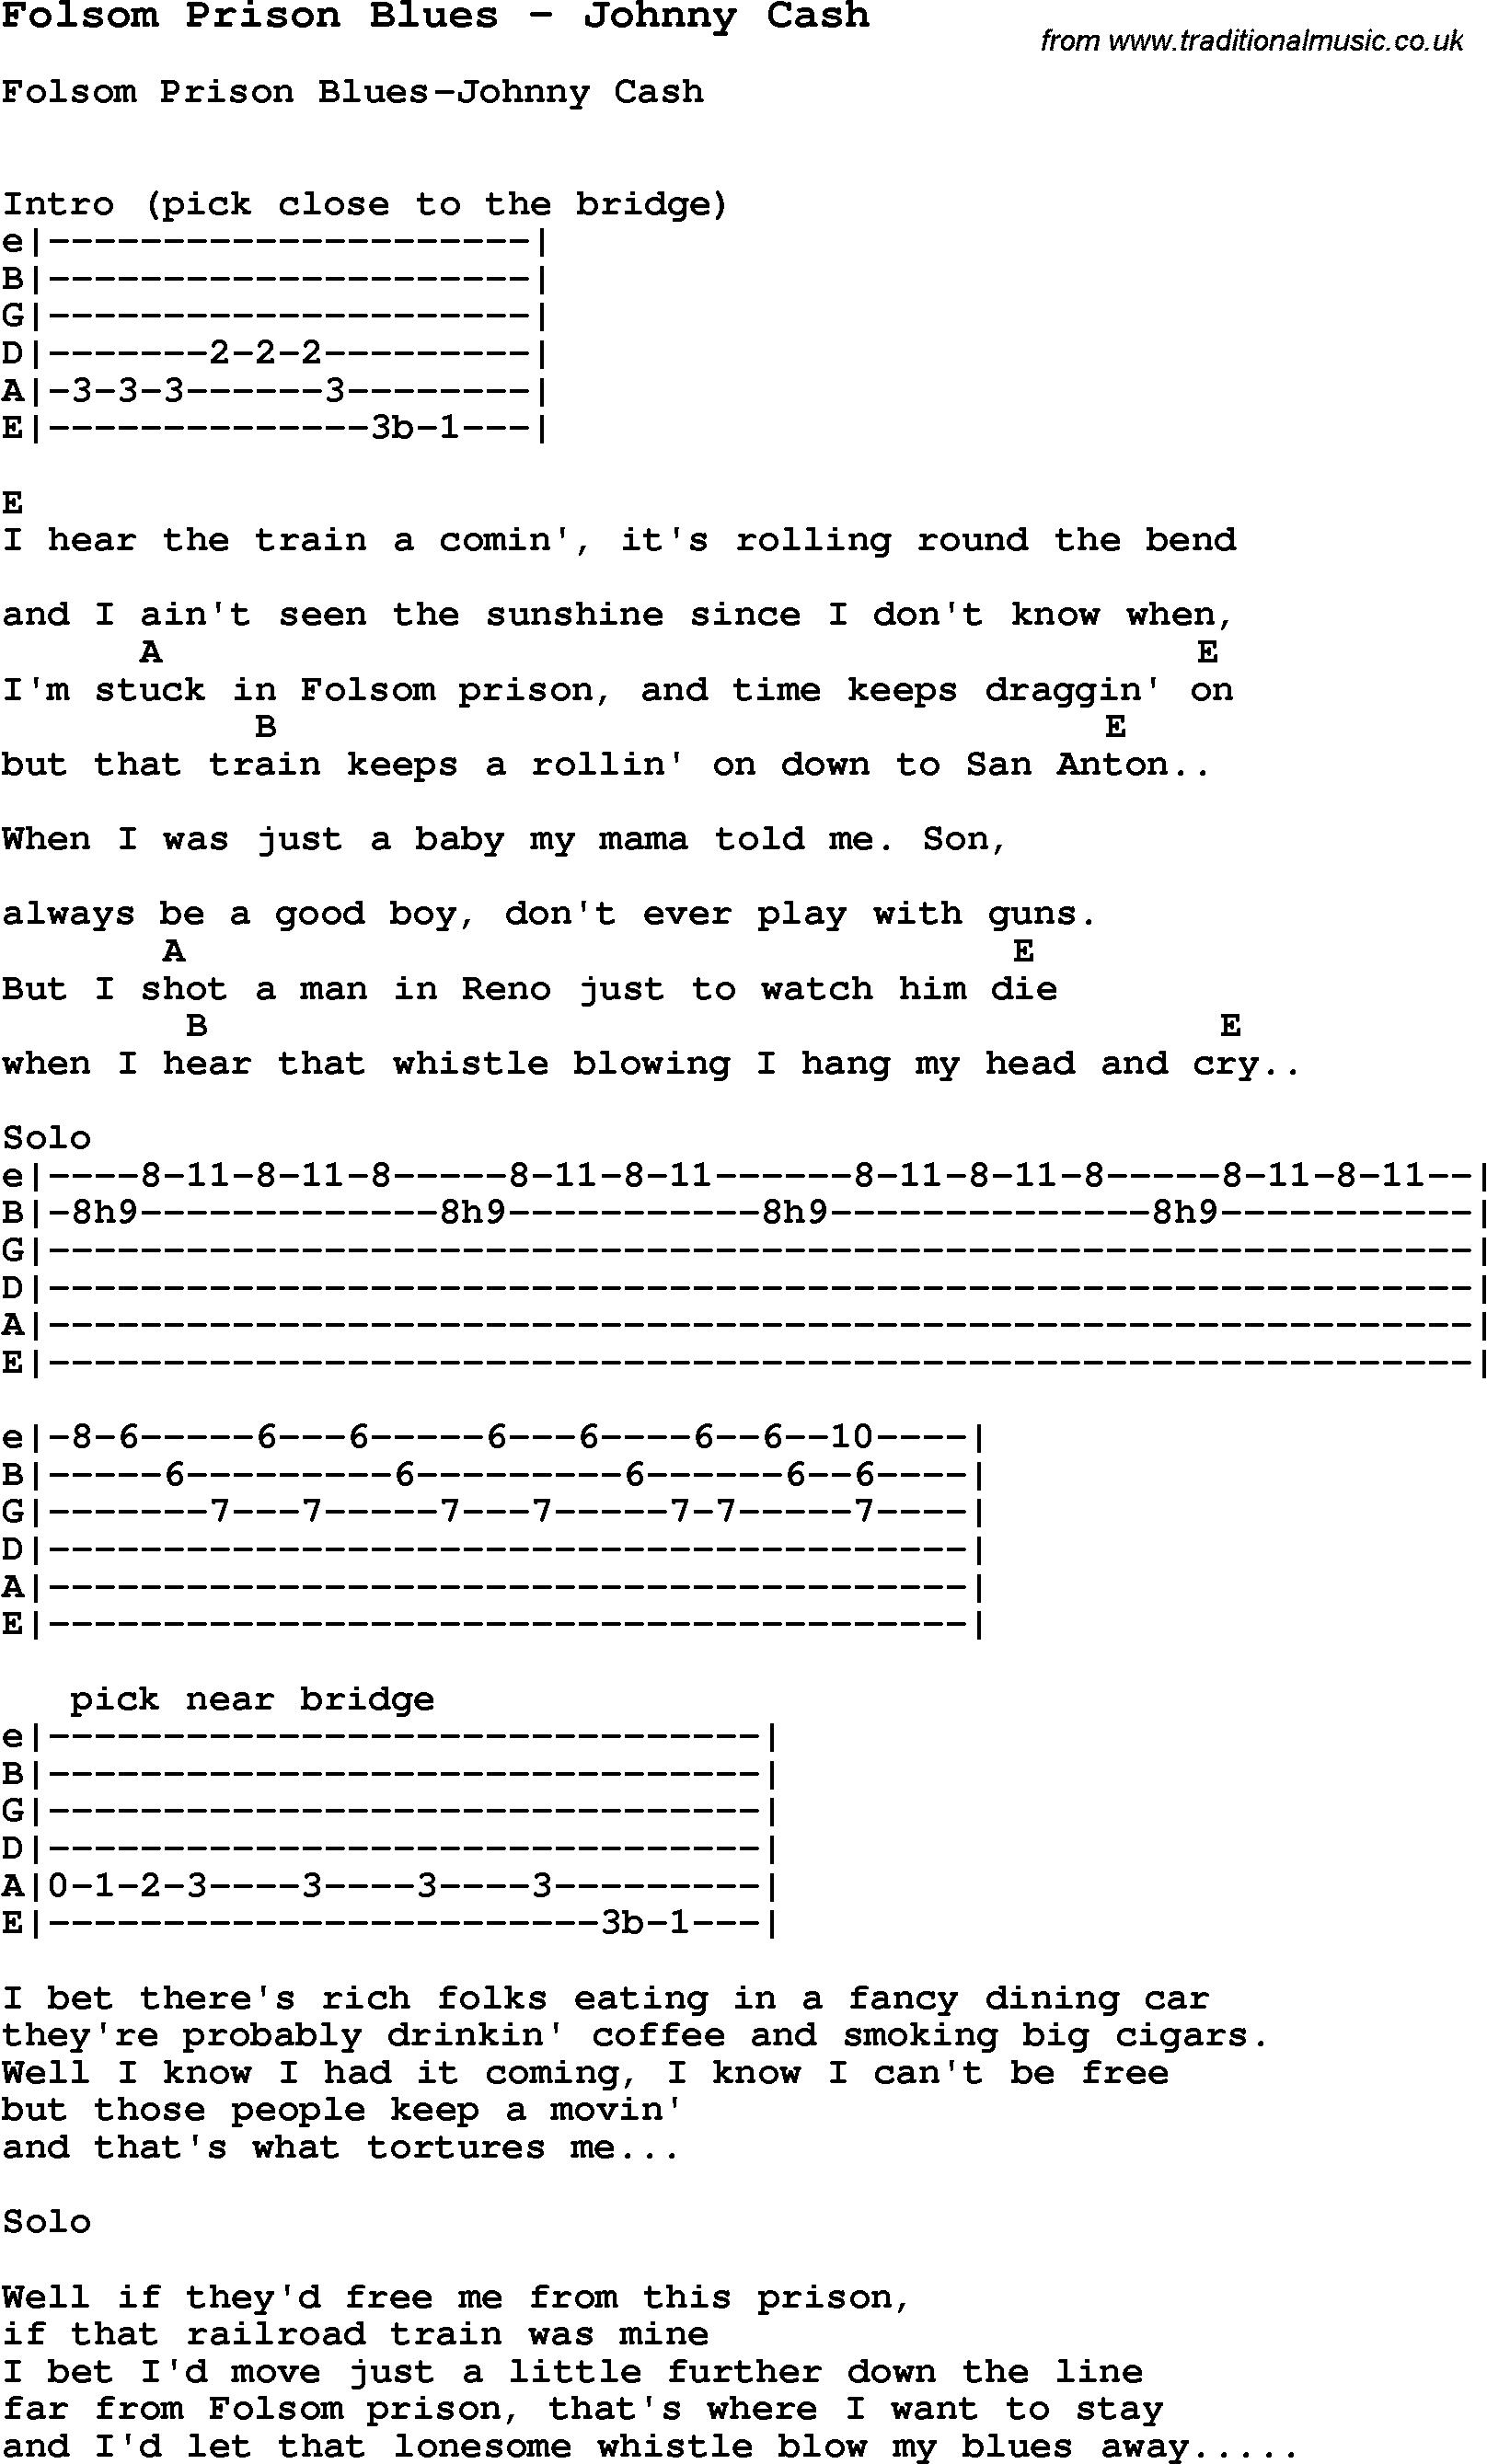 Folsom Prison Blues Chords Scenetesz